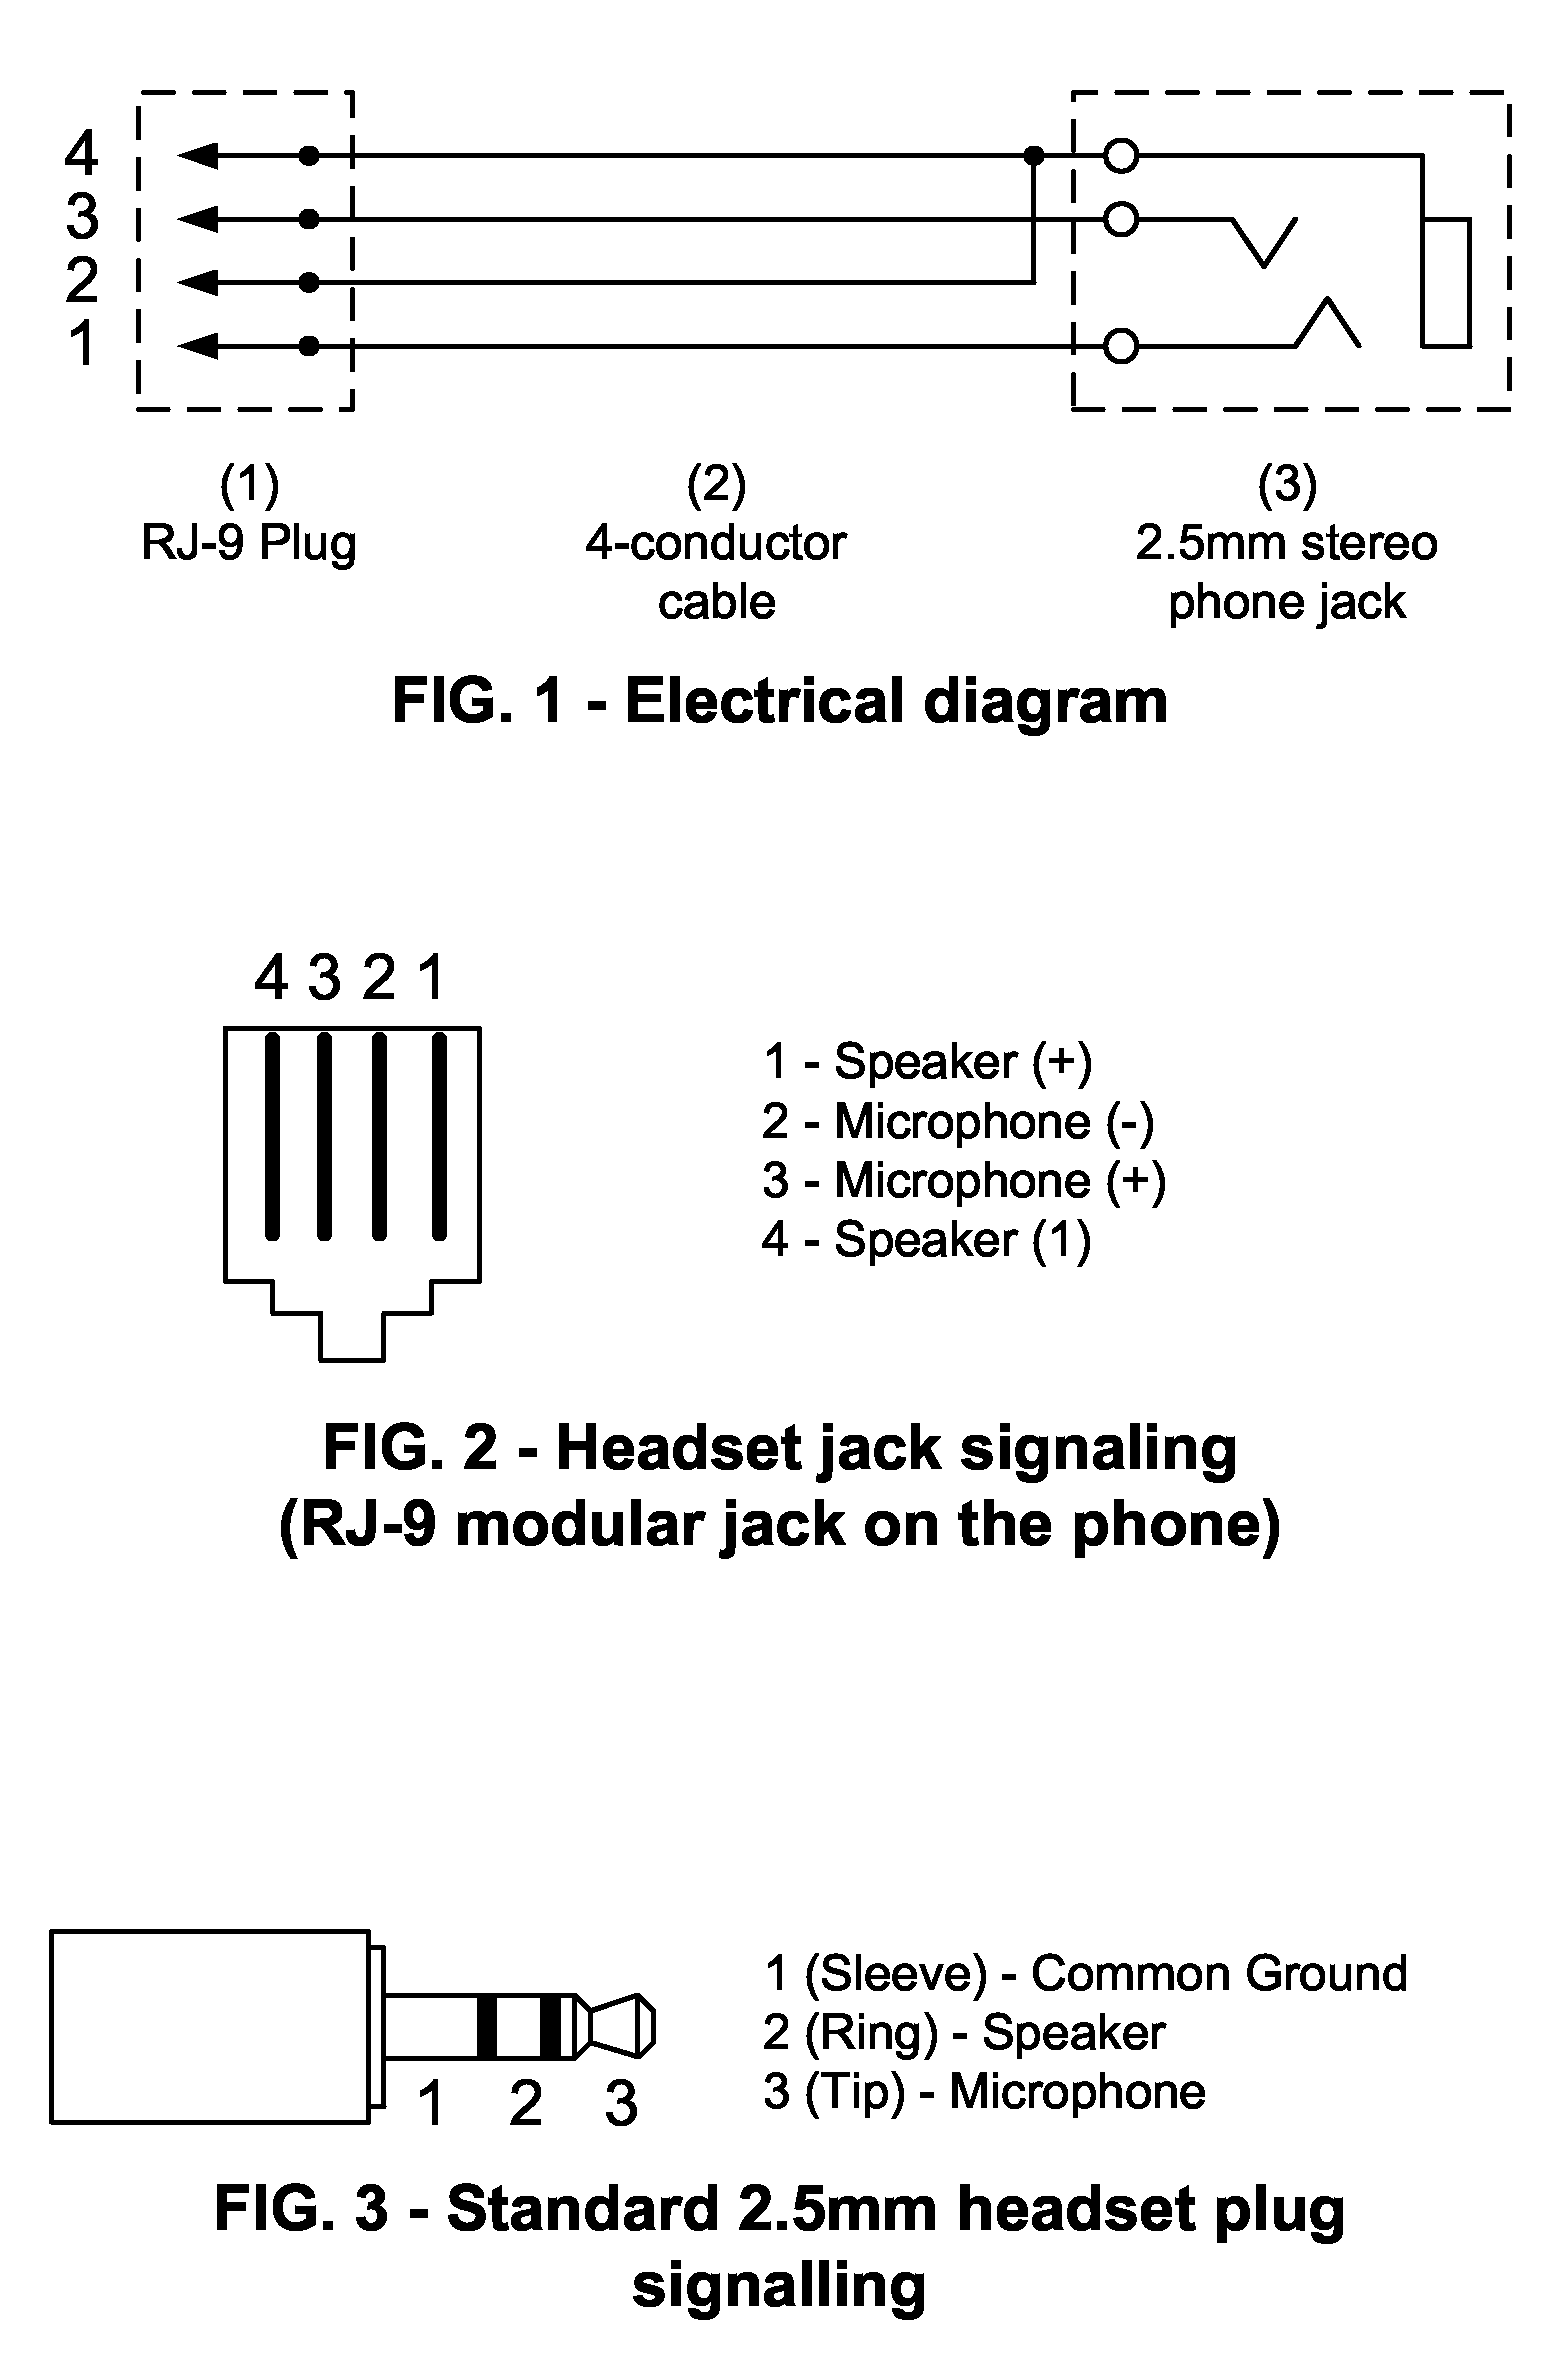 Stereo Phone Plug Wiring Diagram 92 Subaru Legacy Fuse Box For Wiring Diagram Schematics